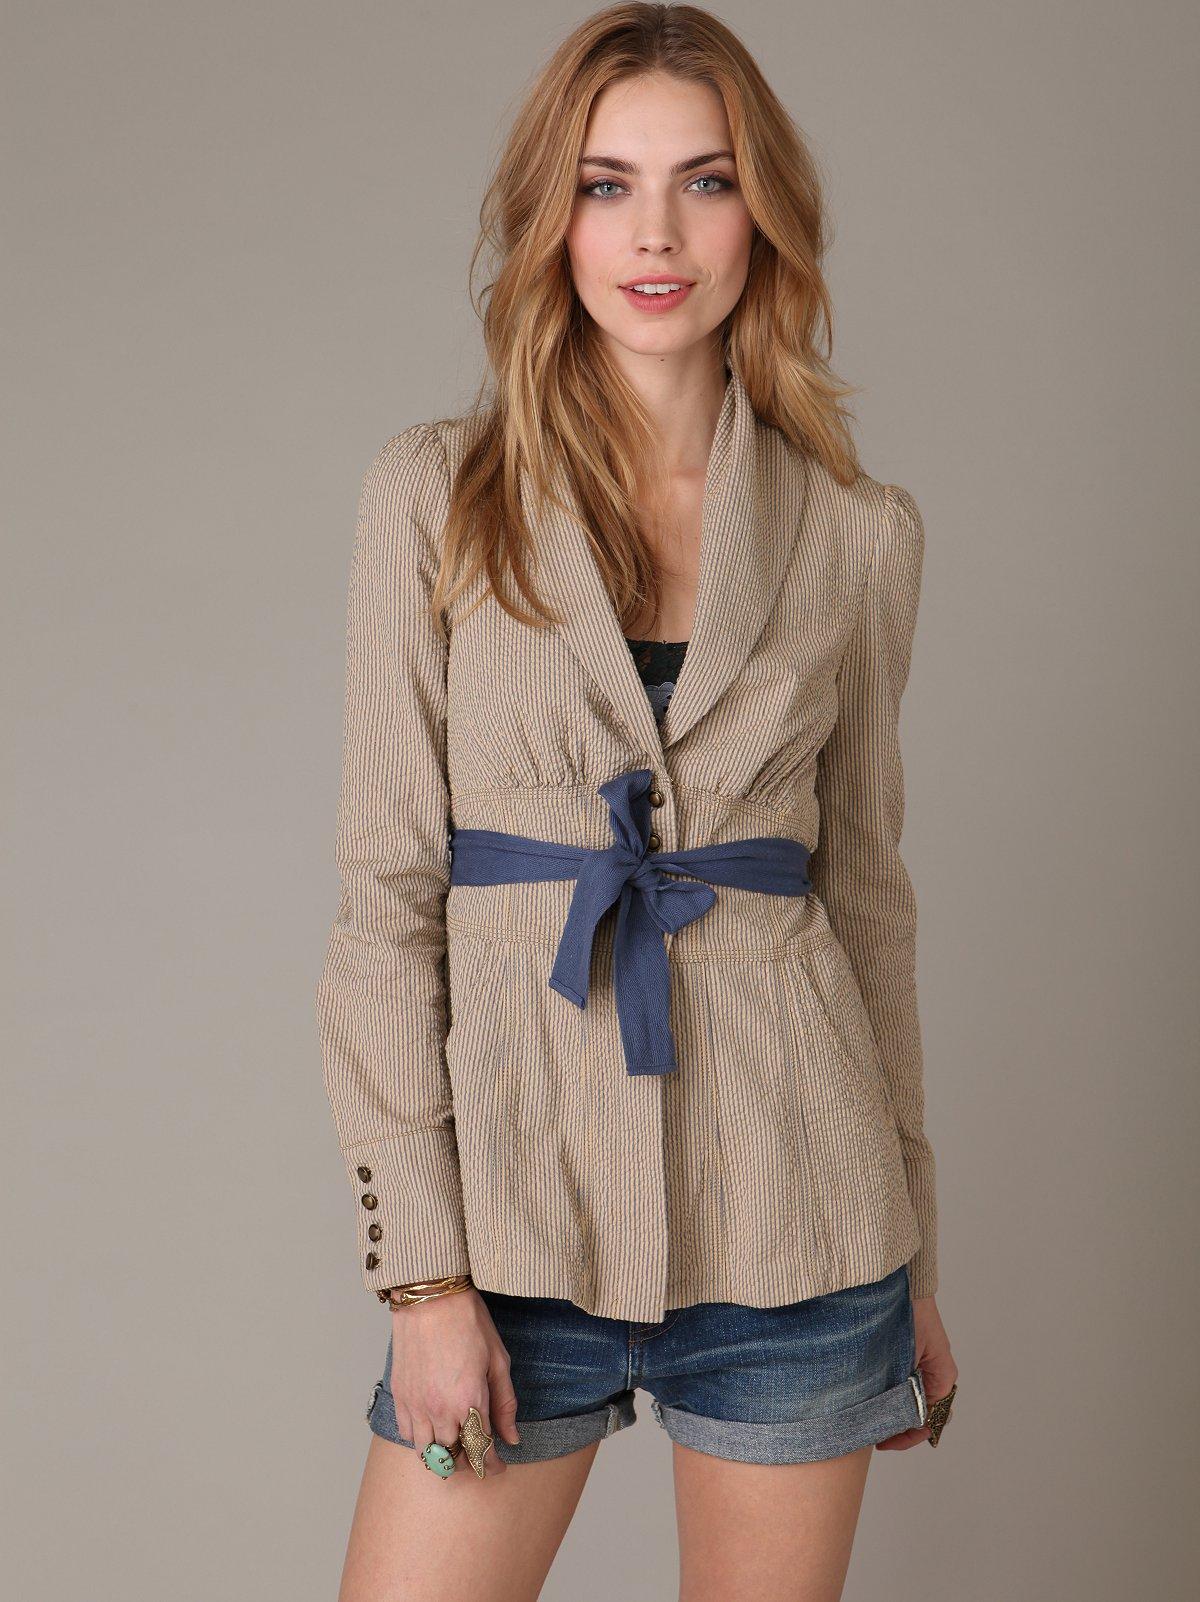 Match Stripe Jacket